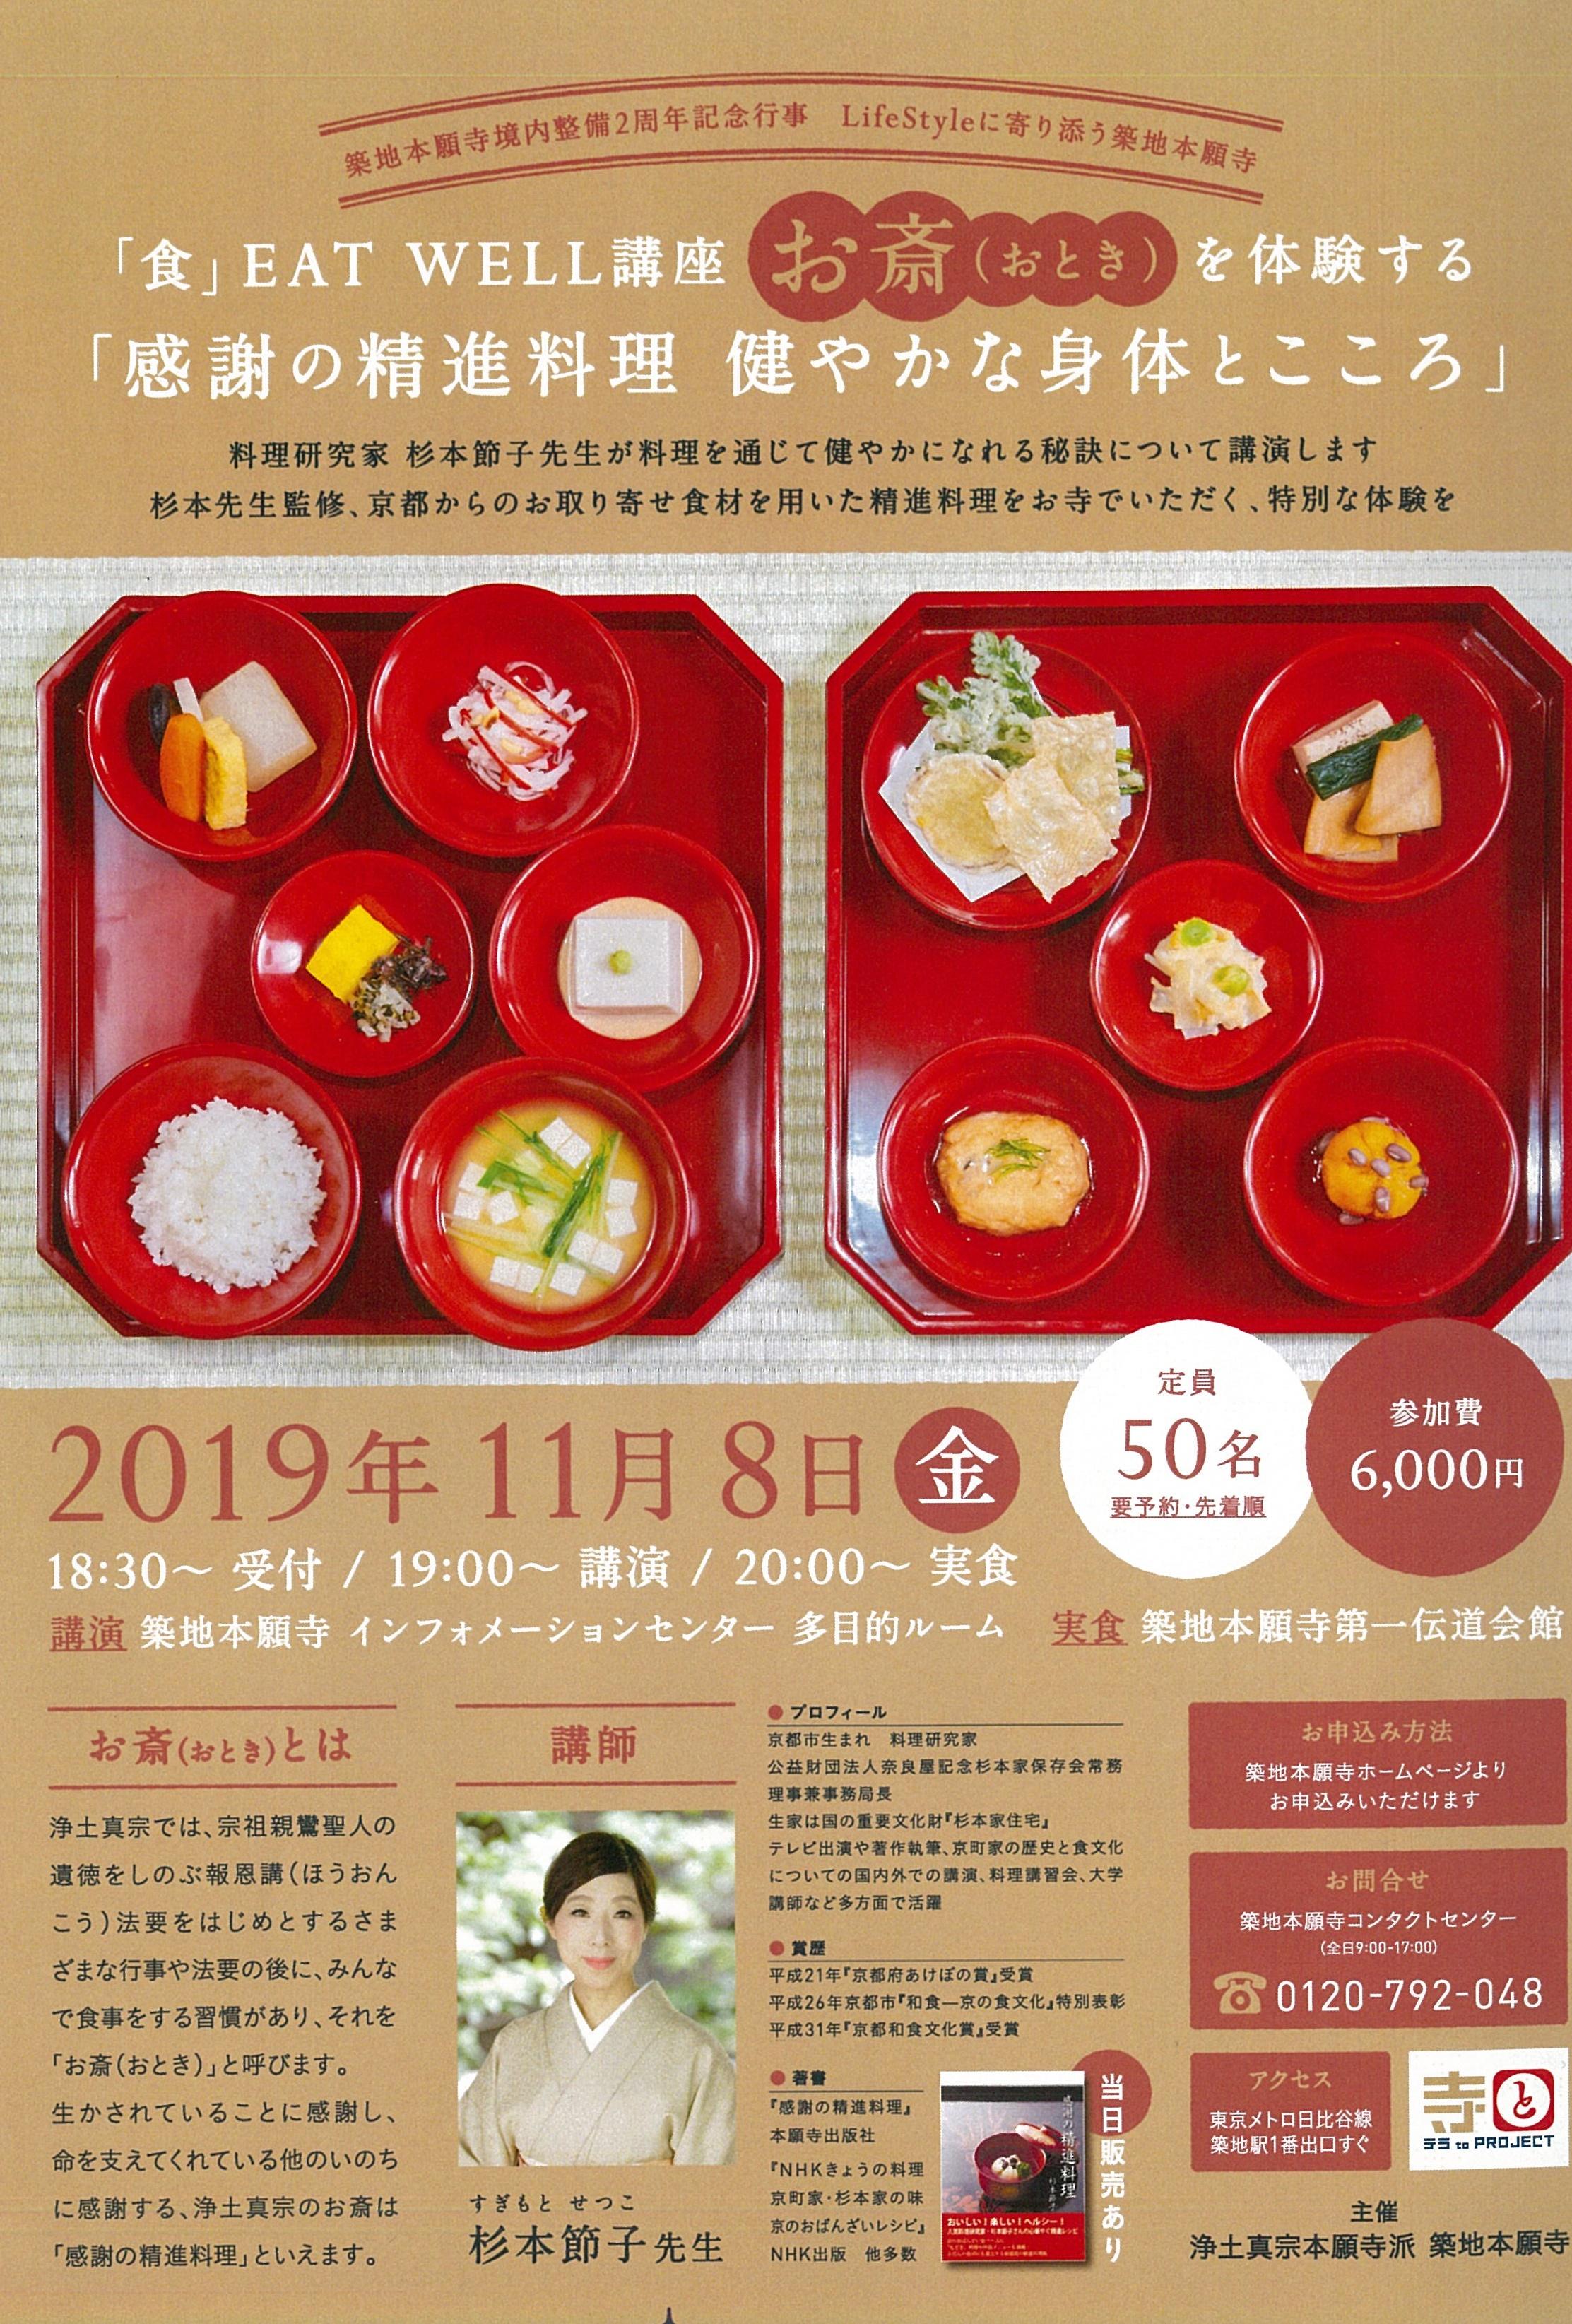 http://www.kyoto-obanzai.jp/blog/upimages/2019/10/20191016161955-0001.jpg